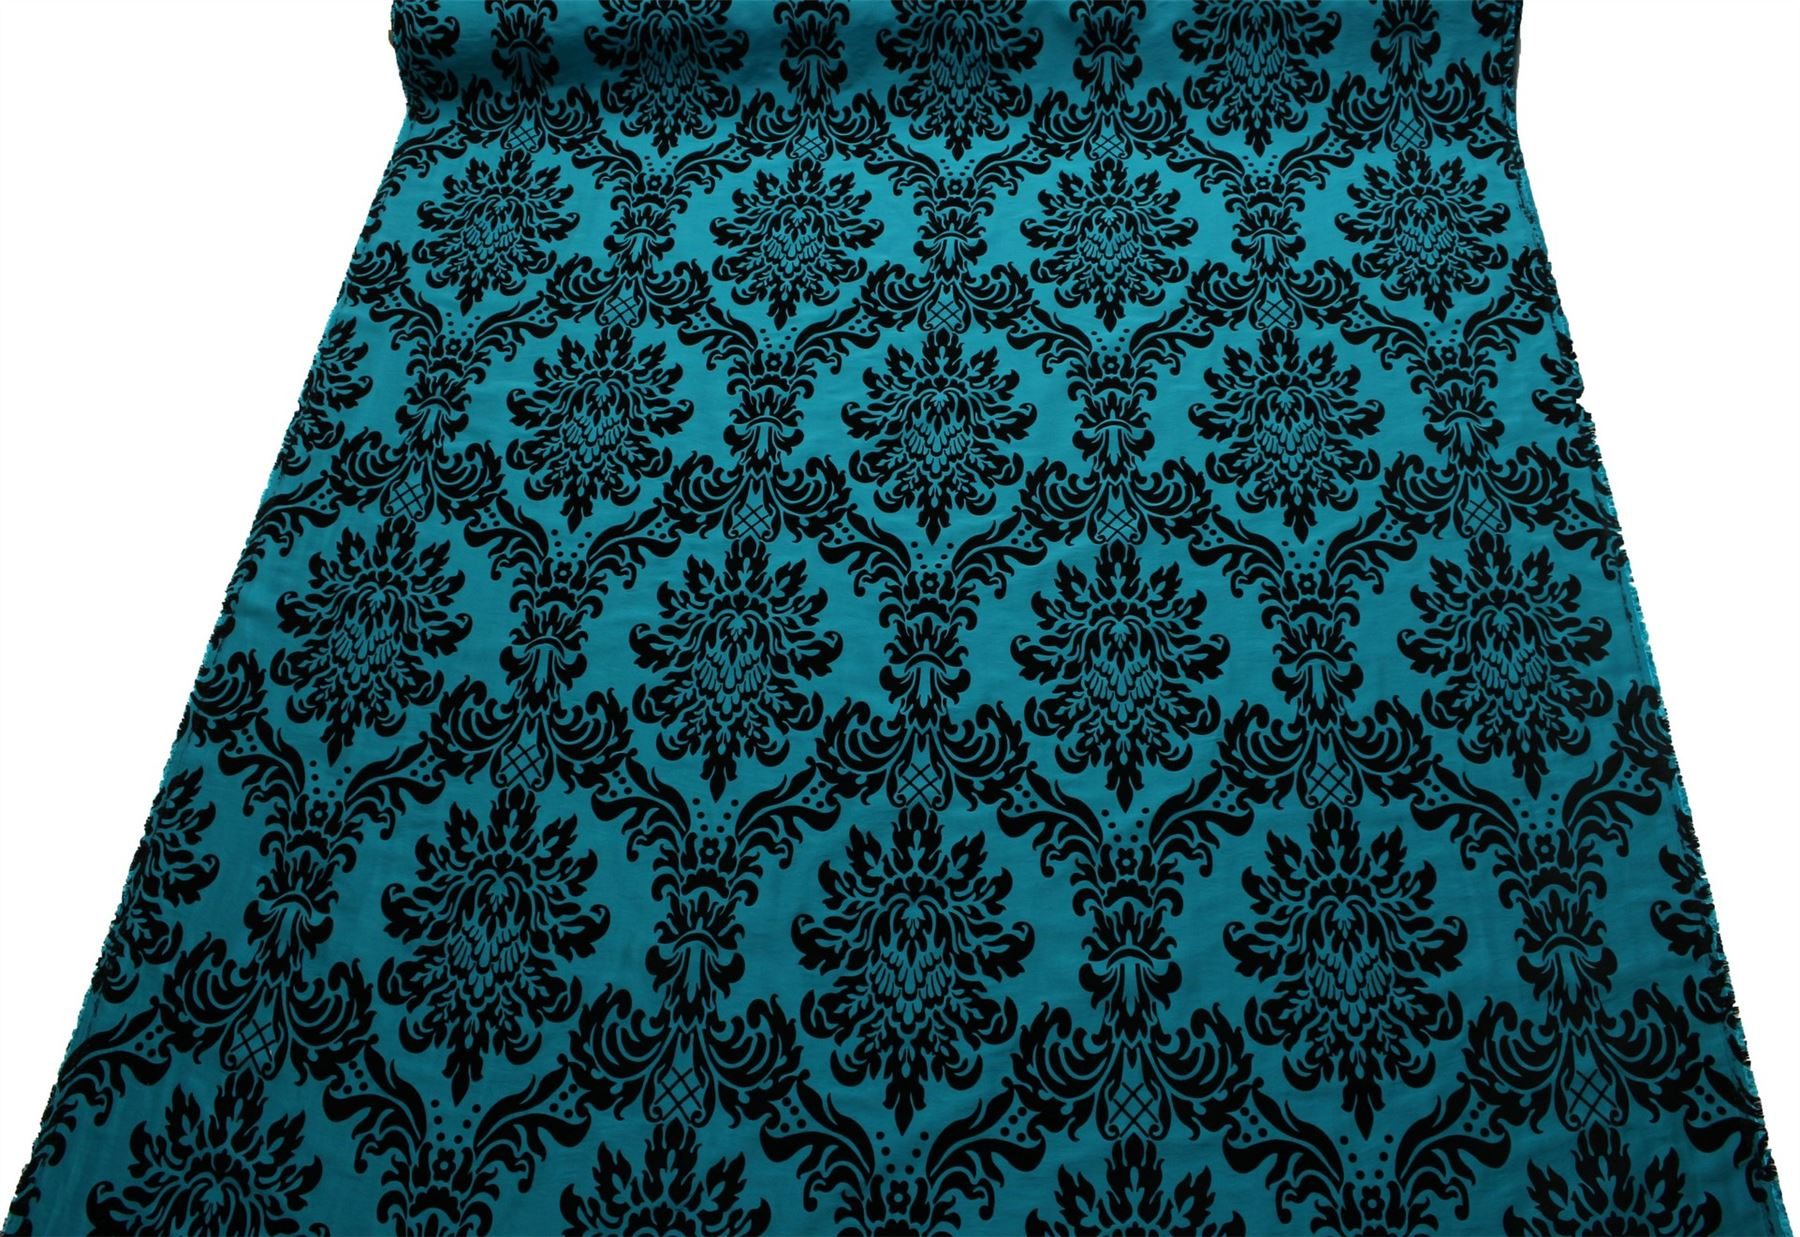 Victoria-Floral-Tafetan-Damasco-Terciopelo-Conjunto-Tapiceria-Cortinas-Tejido miniatura 42